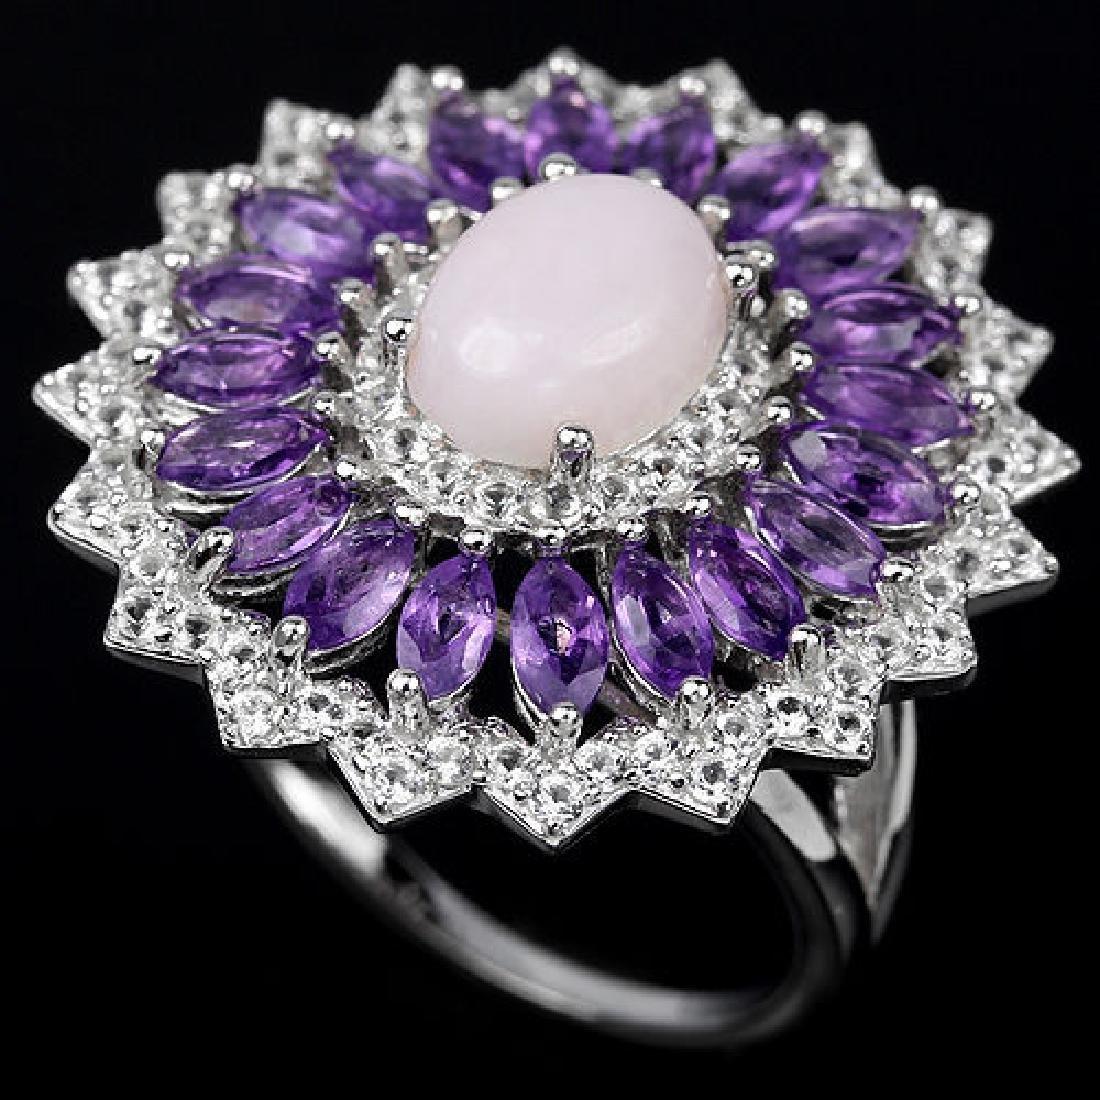 Natural Pink Opal & Amethyst Ring